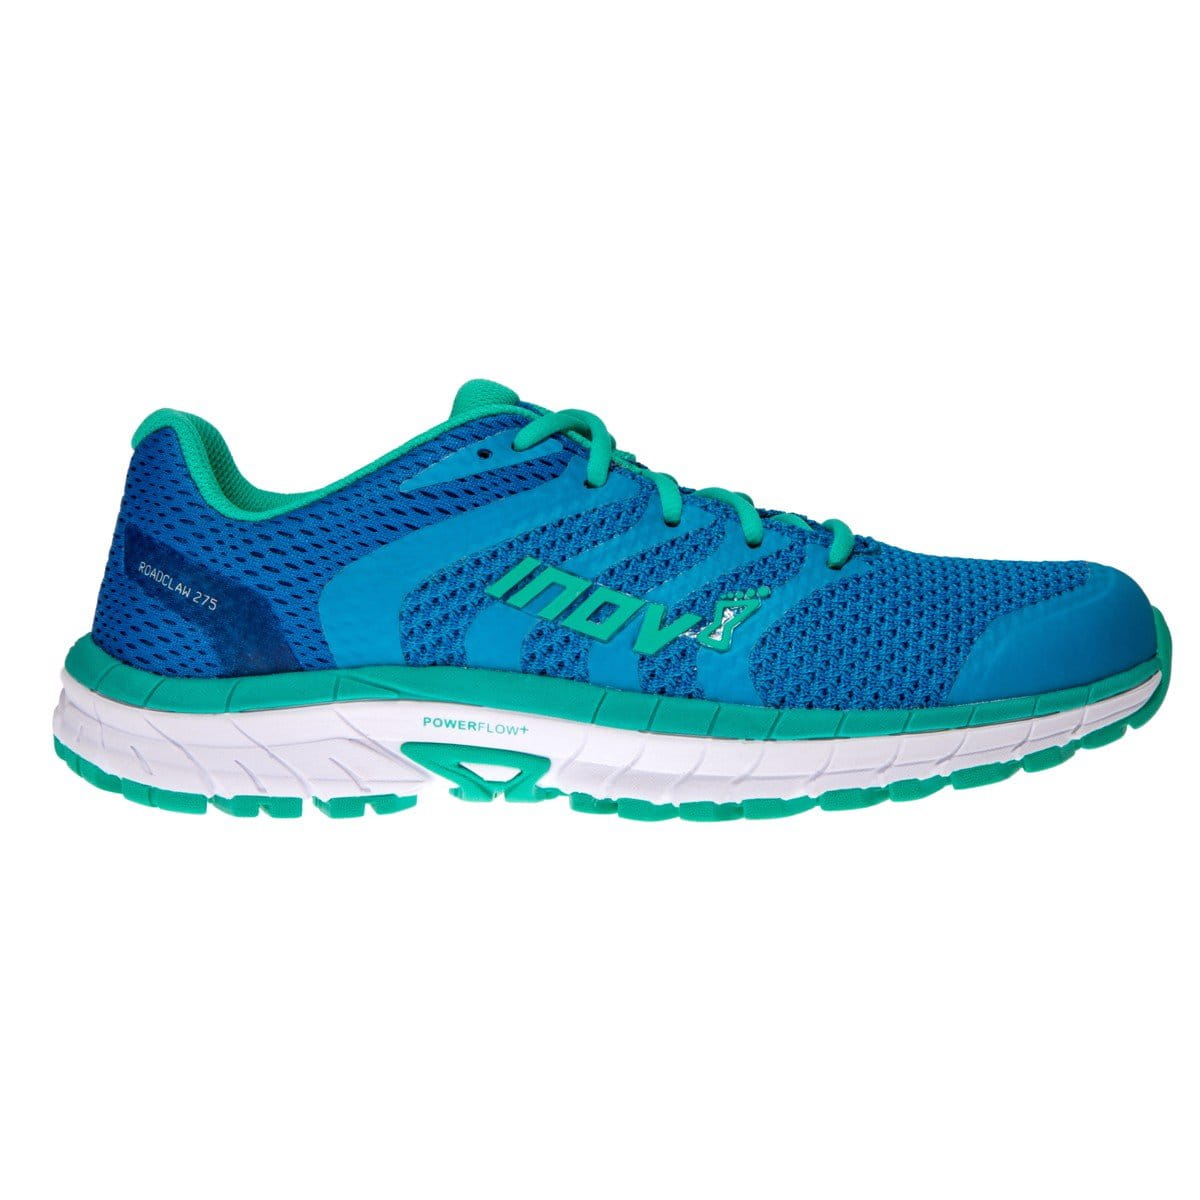 Běžecká obuv Inov-8  ROADCLAW 275 KNIT W (S) blue/teal modrá/zelená